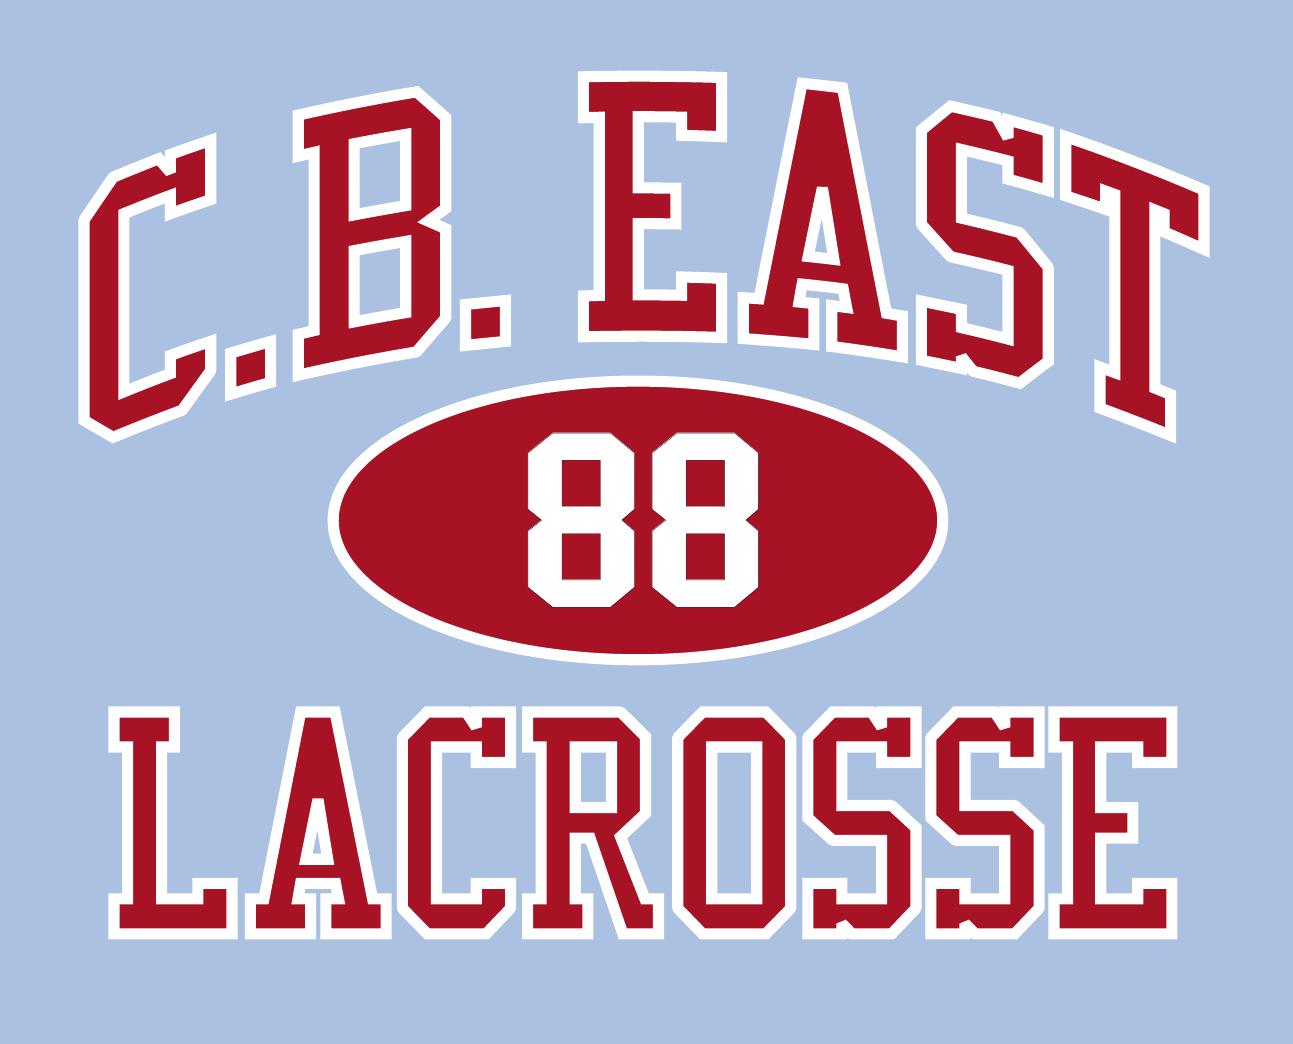 CB East Lacrosse 1